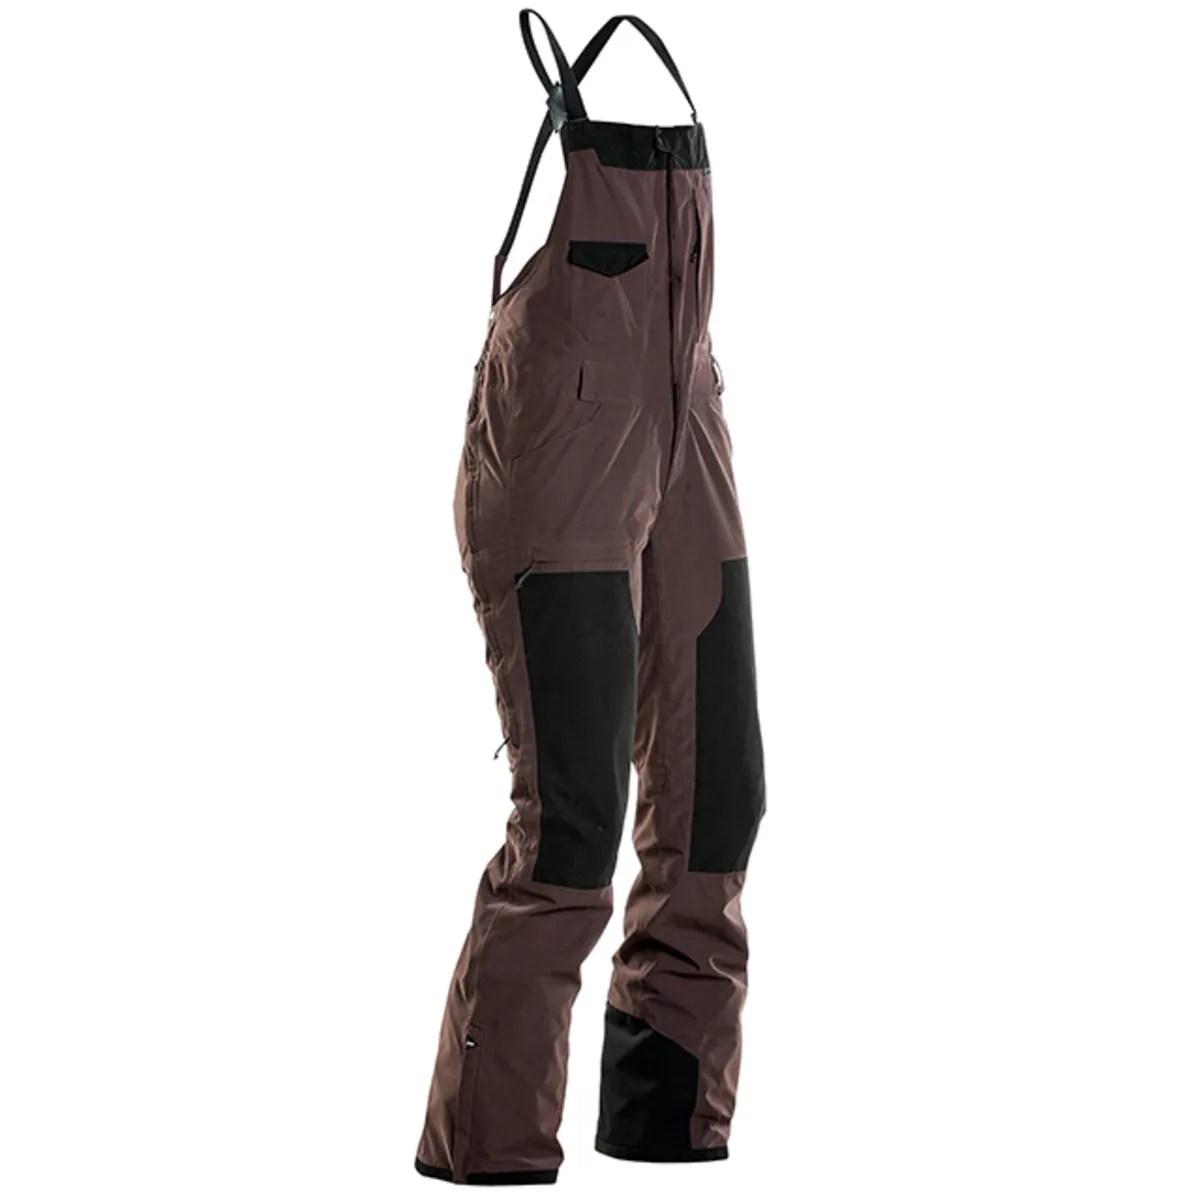 Womens Insulated Snow Pants Waterproof Windproof Ski Bibs